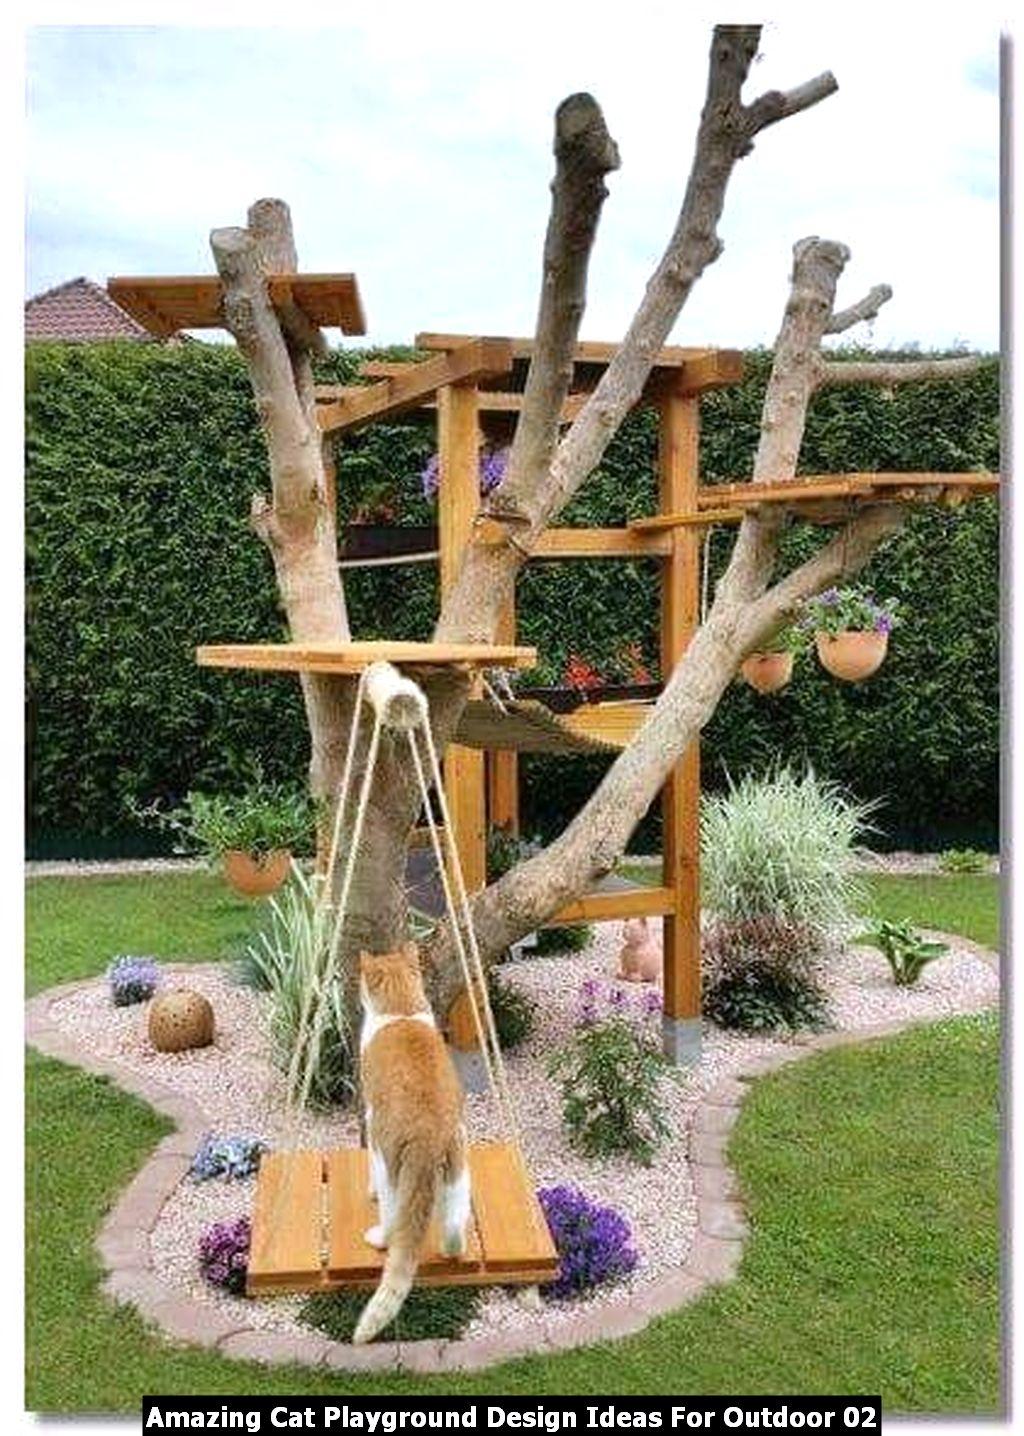 Amazing Cat Playground Design Ideas For Outdoor 02